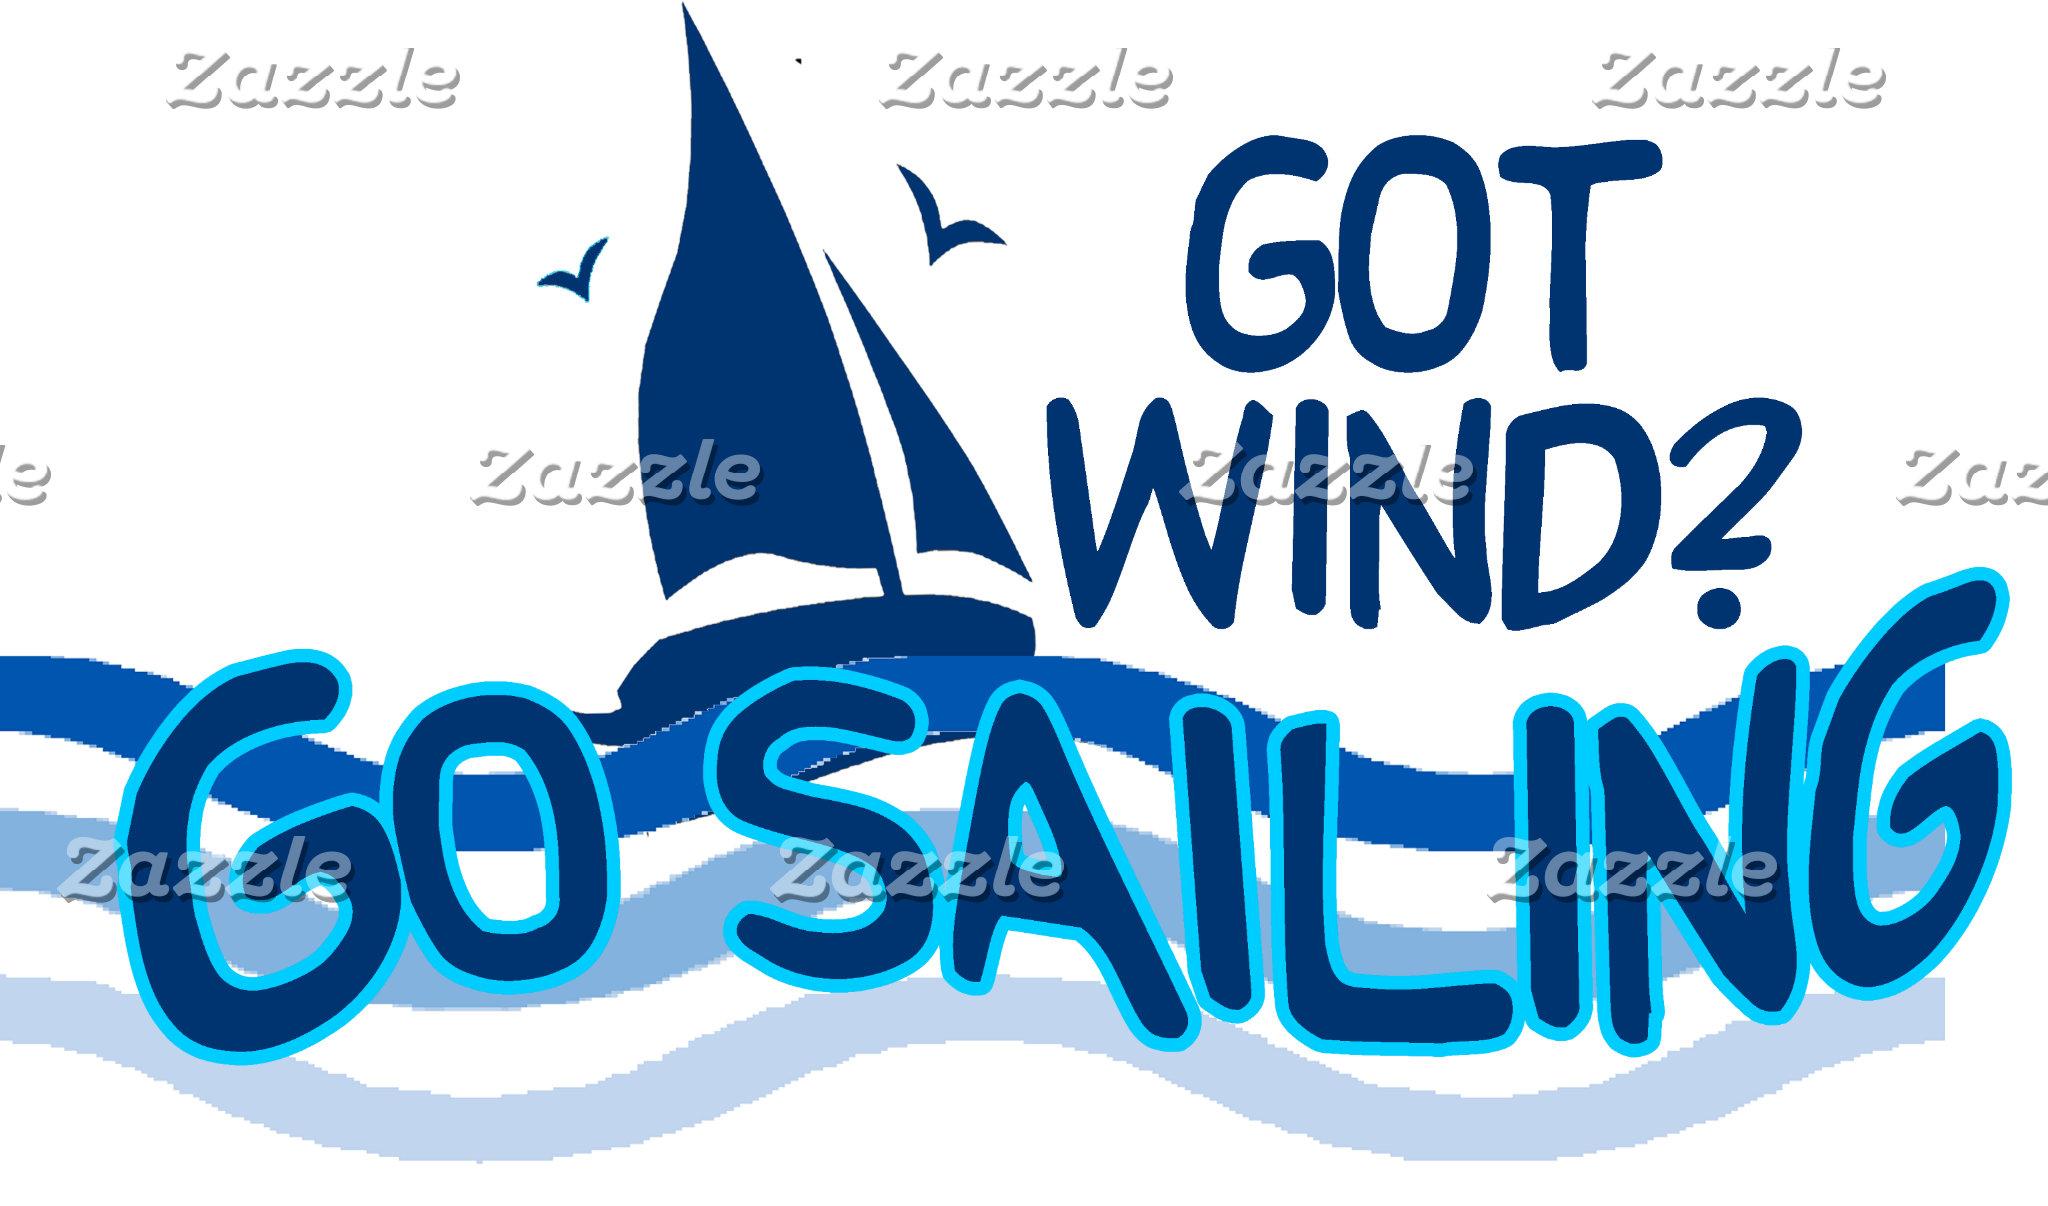 More Funny Boating Shirts